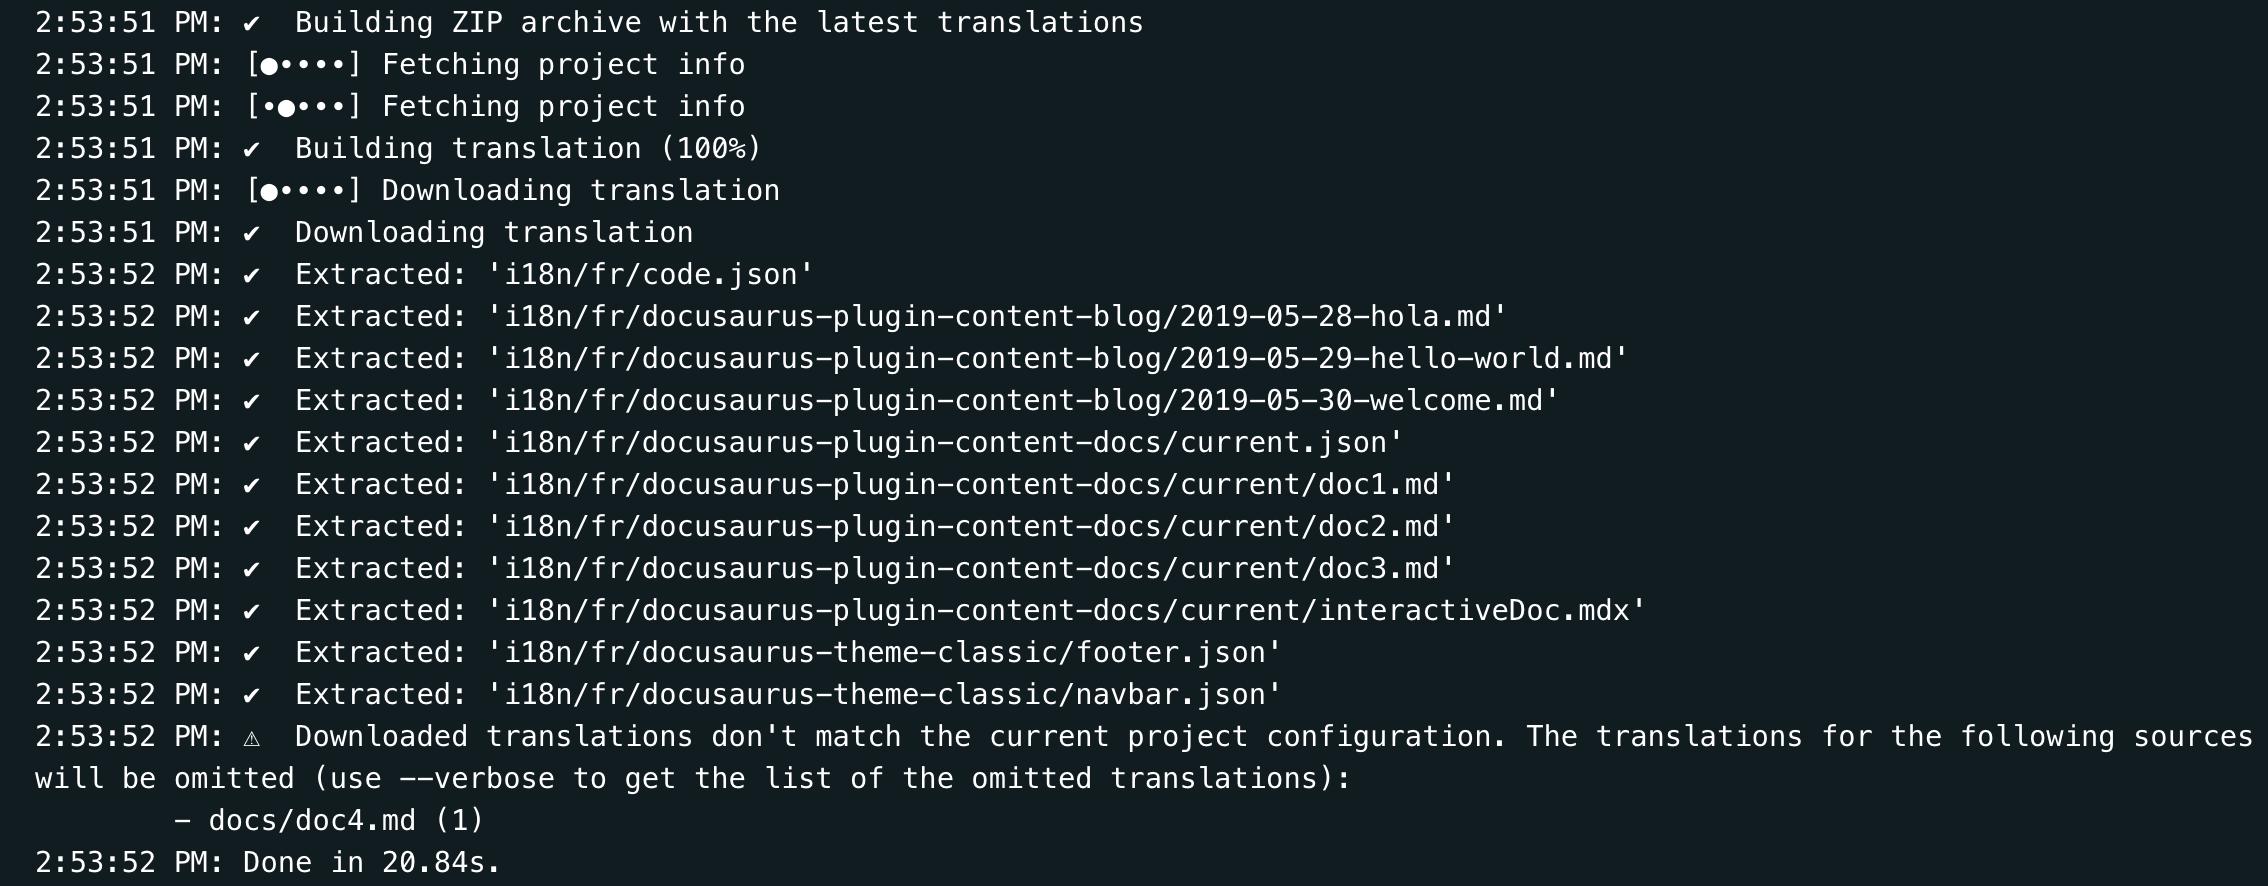 Crowdin CLI: download translation warning